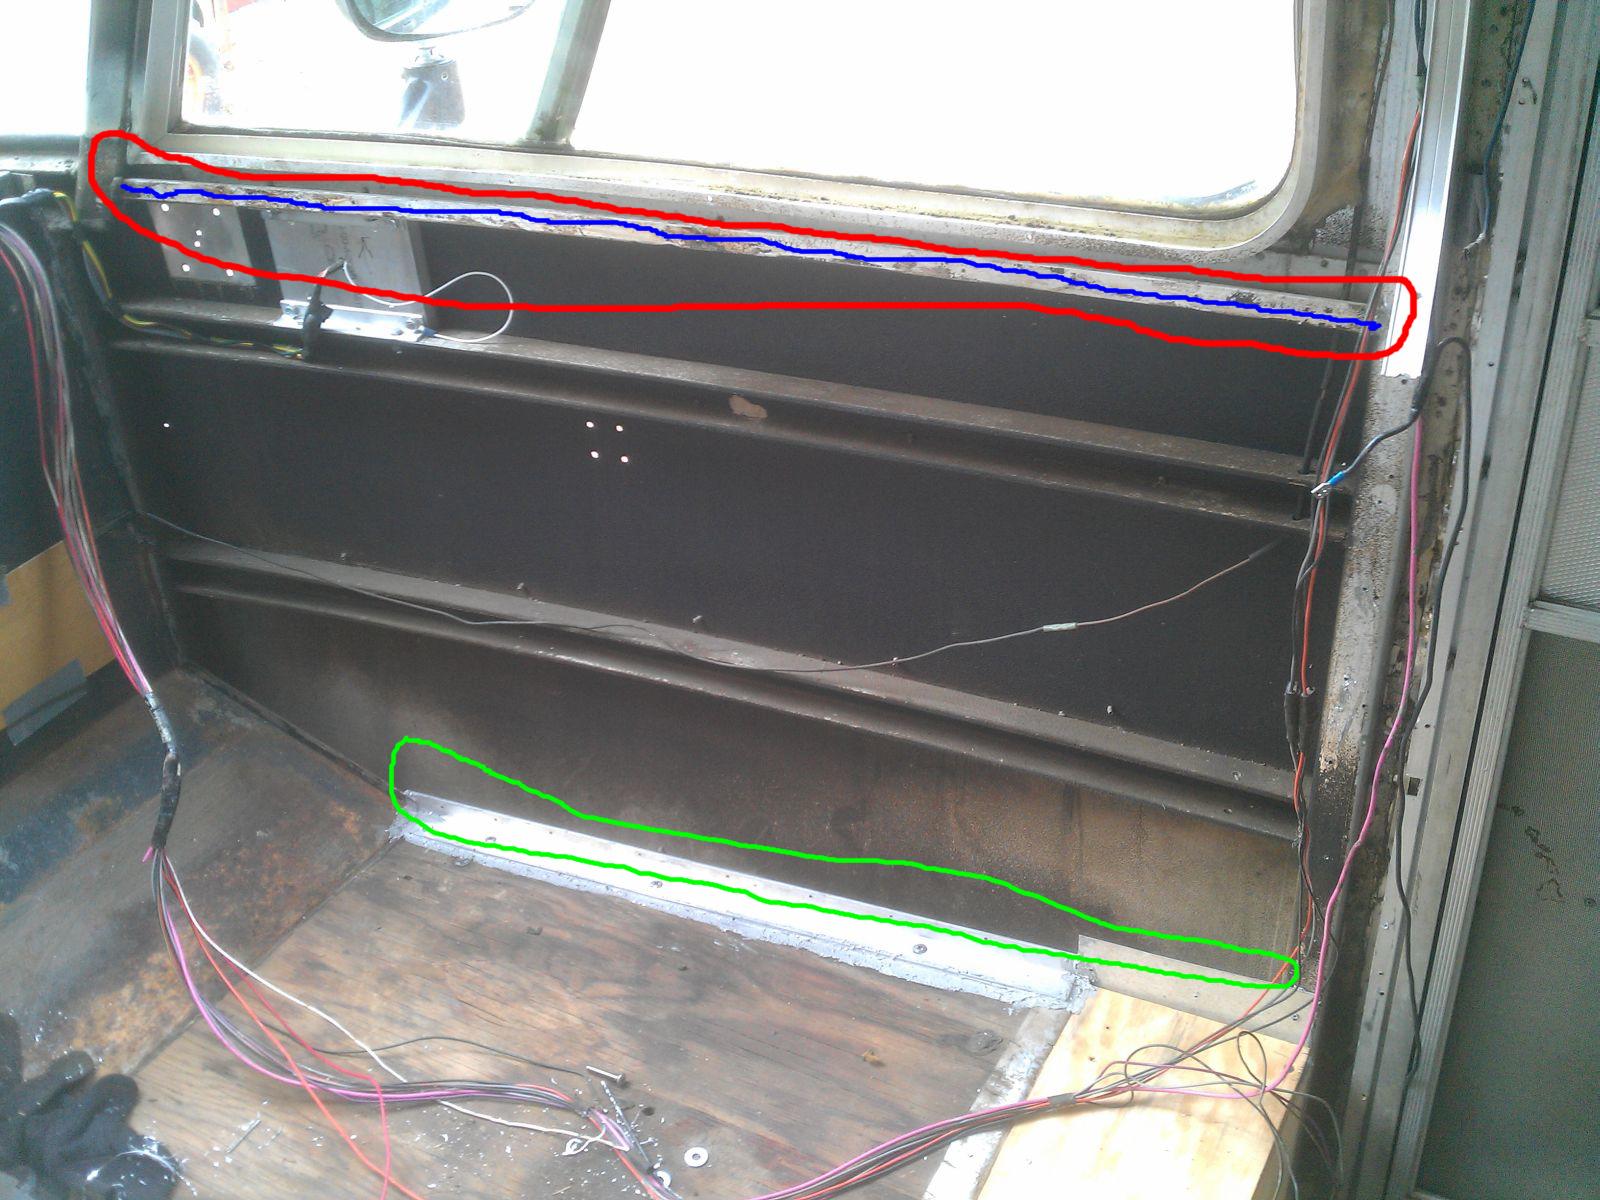 Click image for larger version  Name:74-argosy-rh-cockpit-inner-framework.jpg Views:109 Size:1.14 MB ID:194655